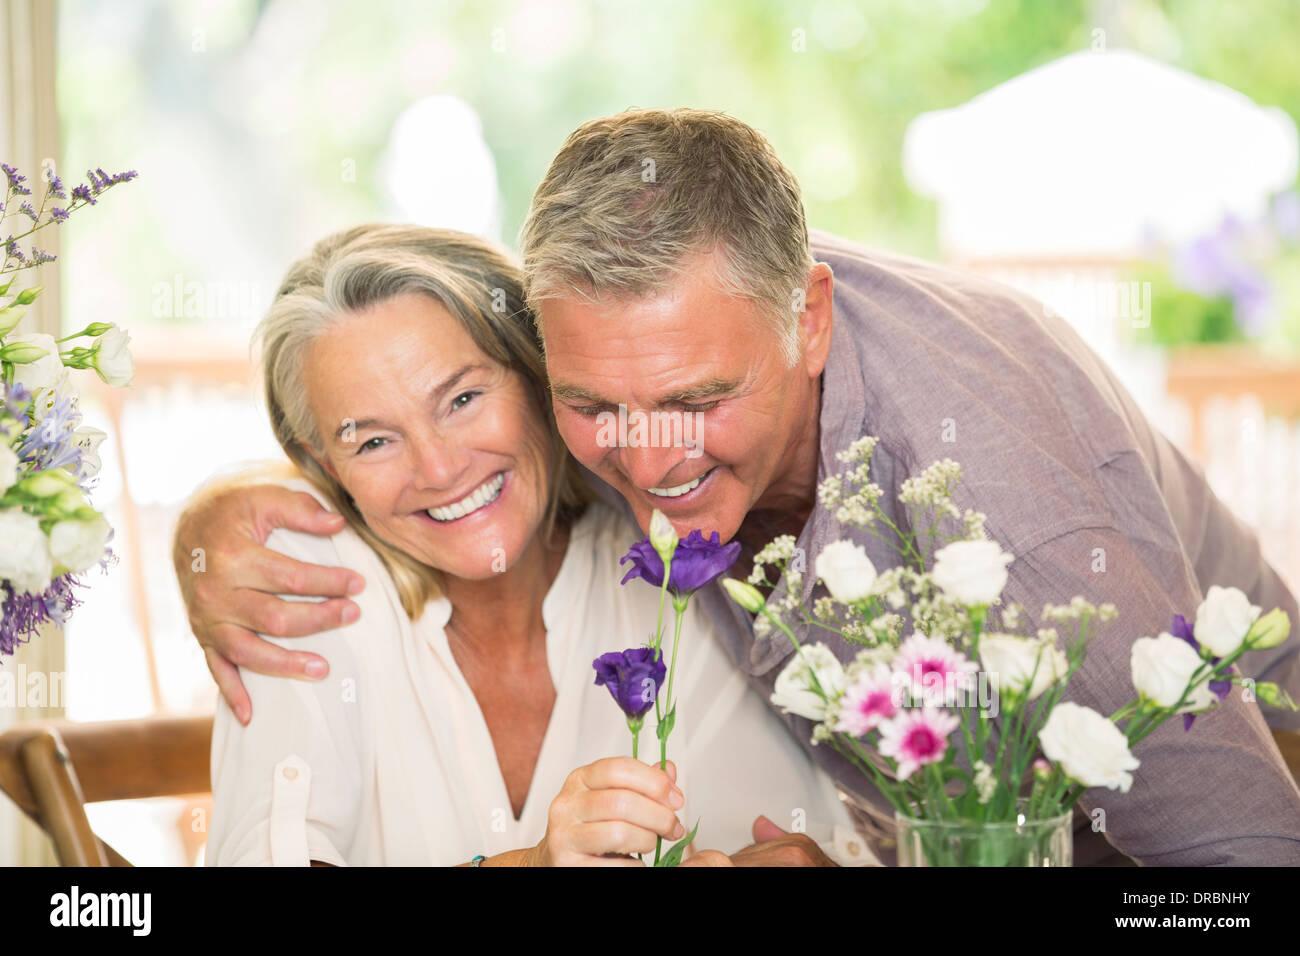 Senior couple smelling flowers - Stock Image